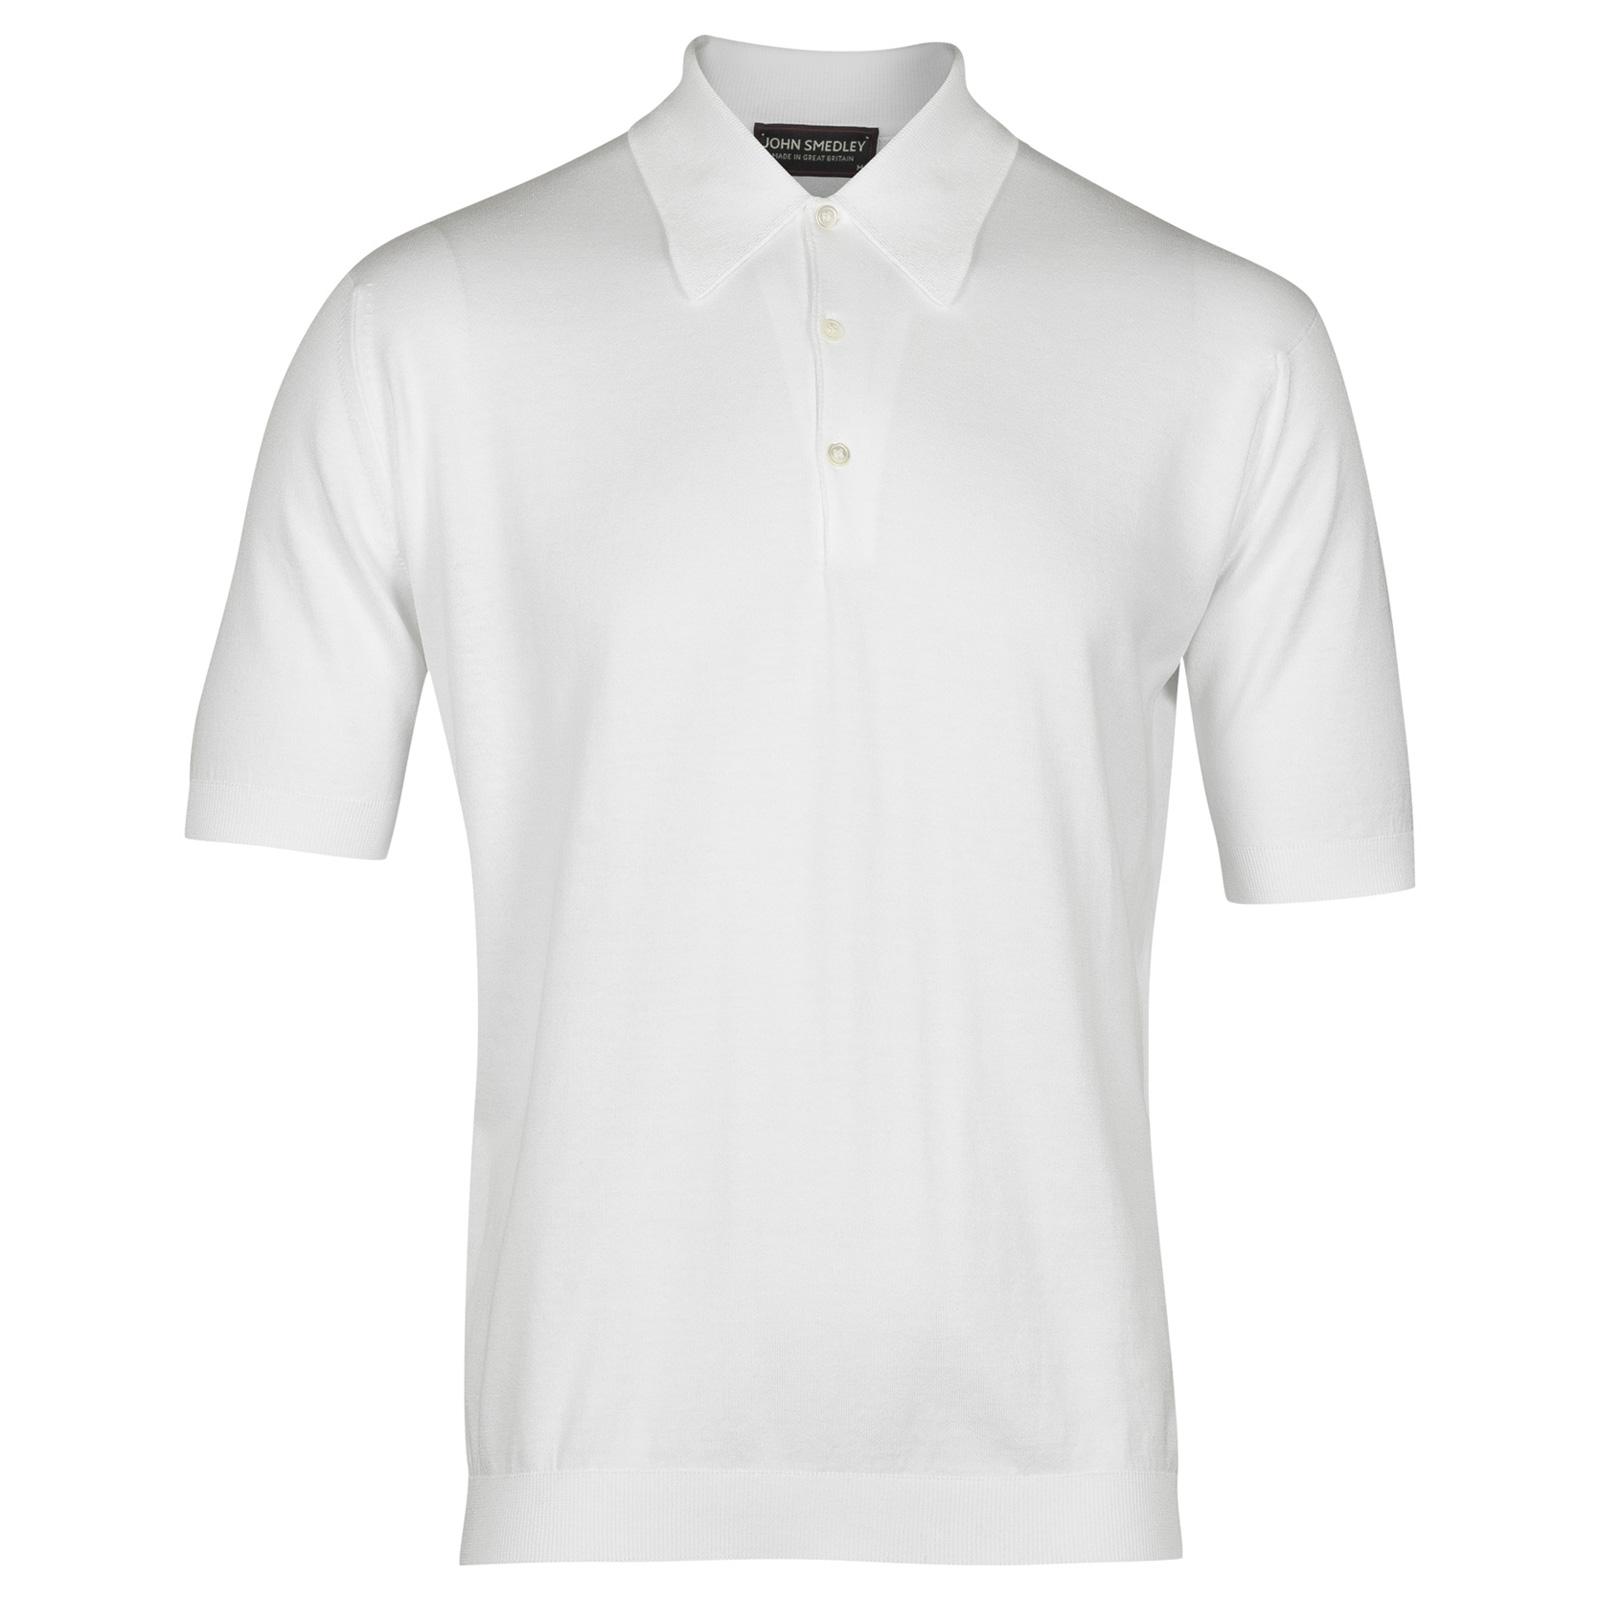 John Smedley Isis Sea Island Cotton Shirt in White-XL